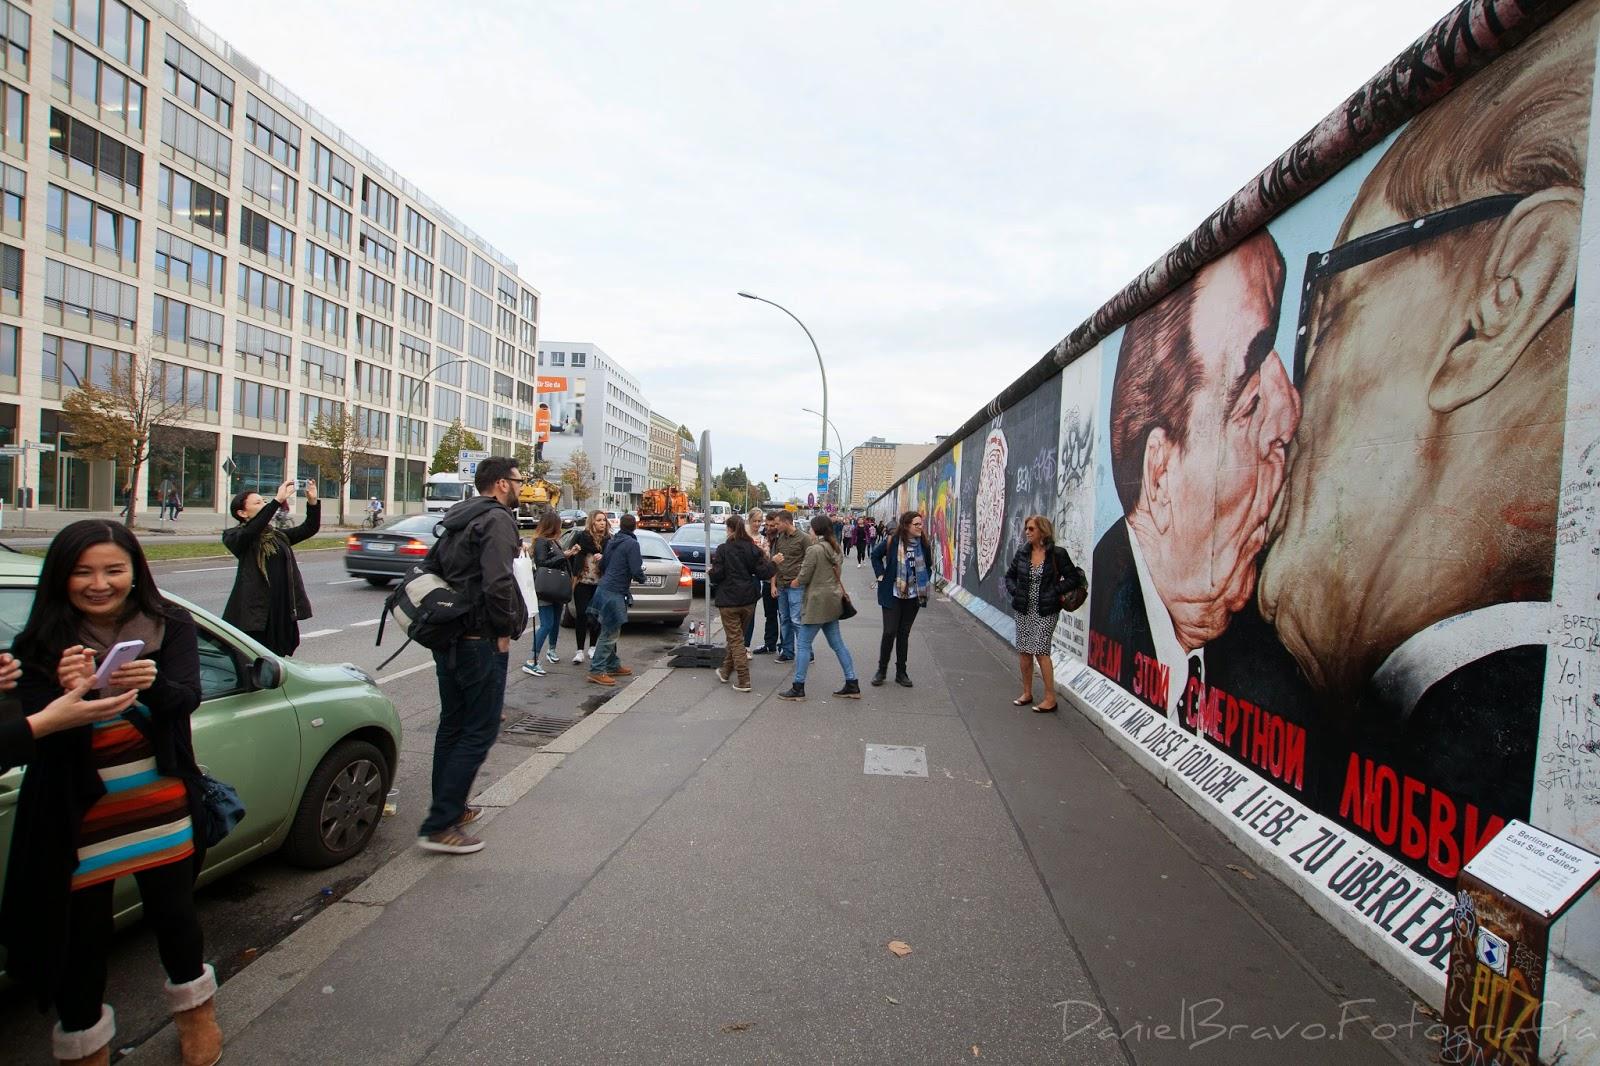 East Side Gallery, muro de Berlín, grafiti, graffity, pintura mural, Berlín, muro, turistas, fotos, Berlin